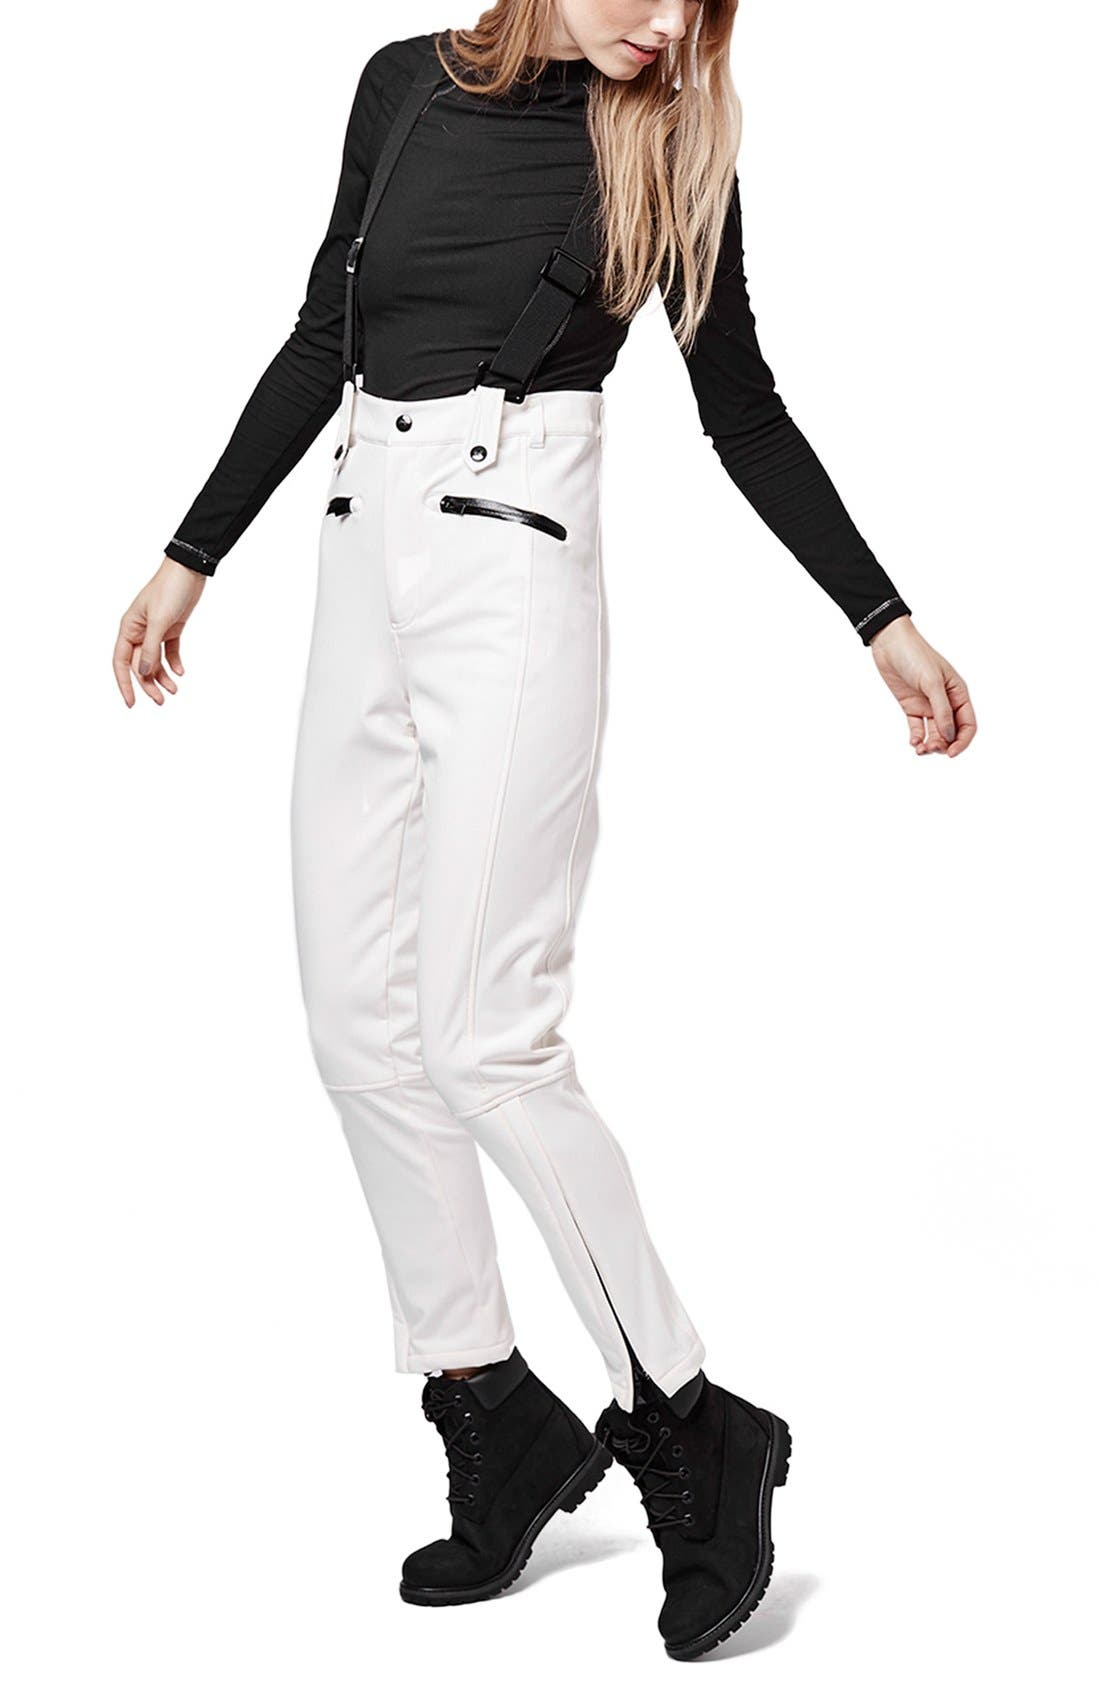 Alternate Image 1 Selected - Topshop 'Tyrian' Overall Ski Pants